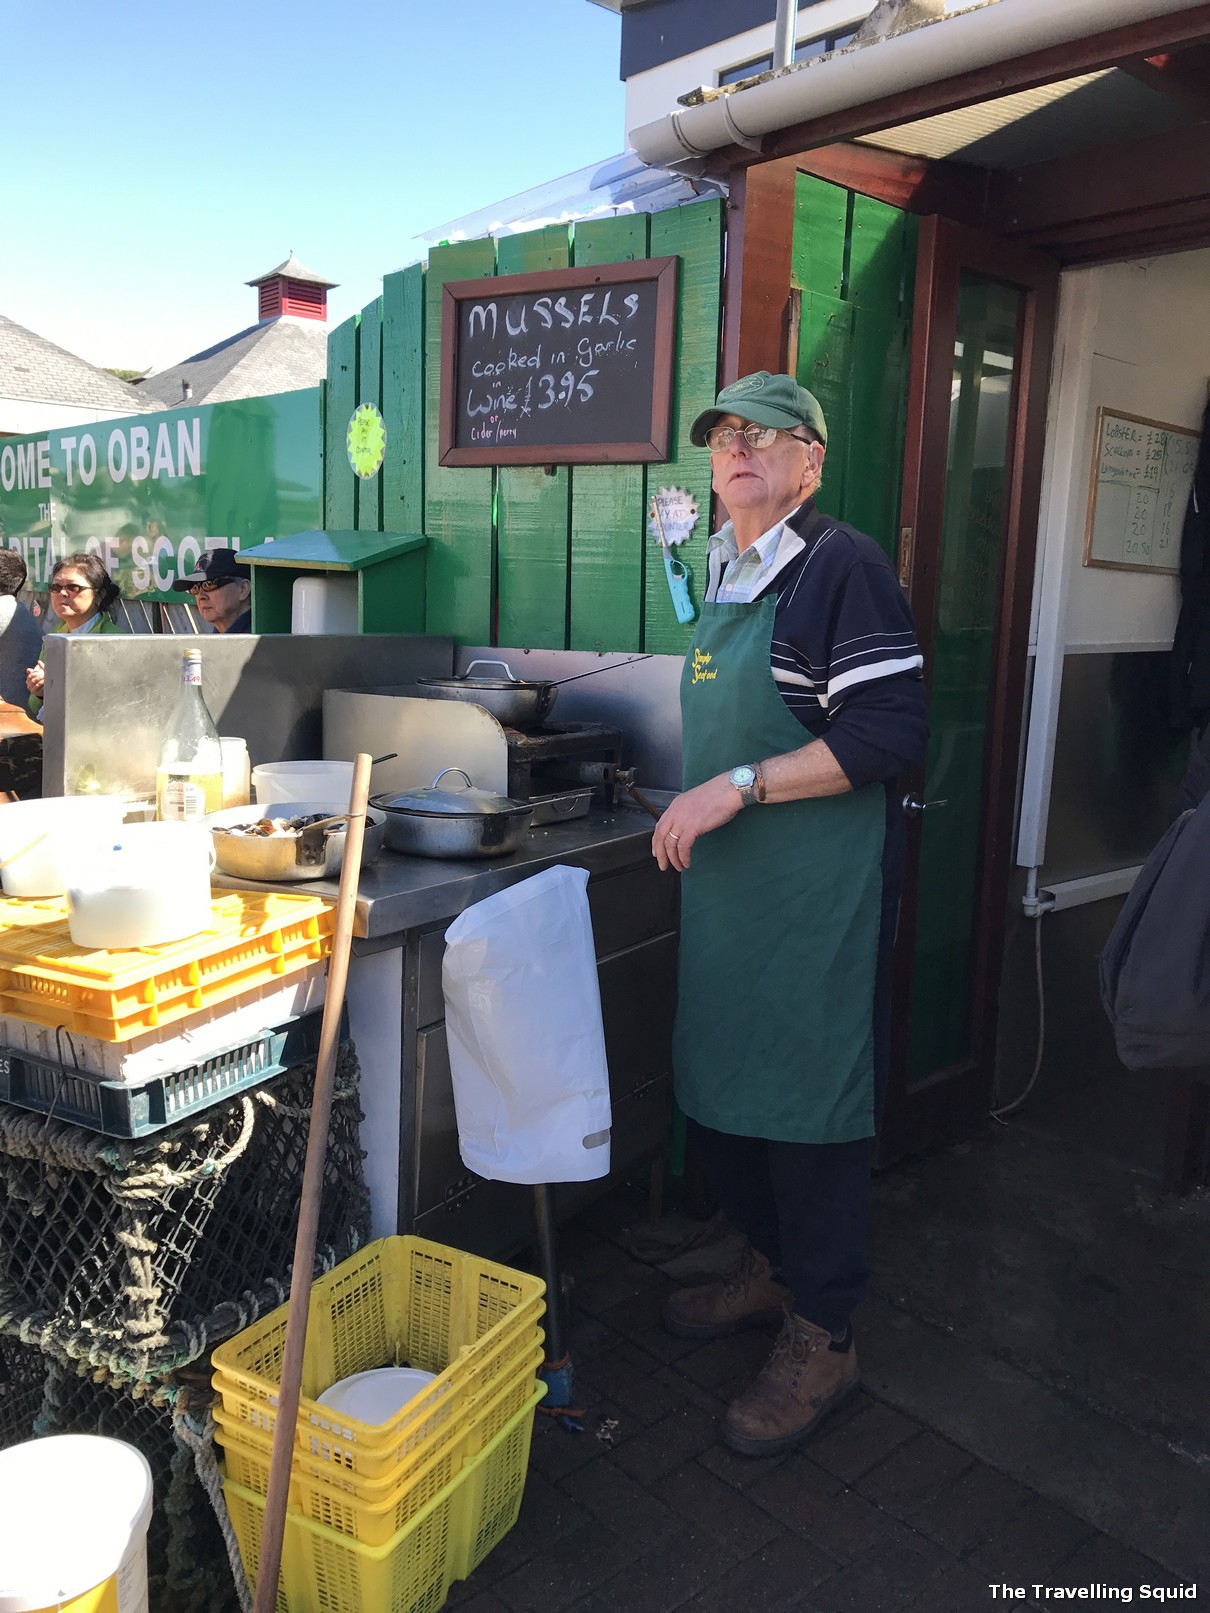 oban seafood hut pier